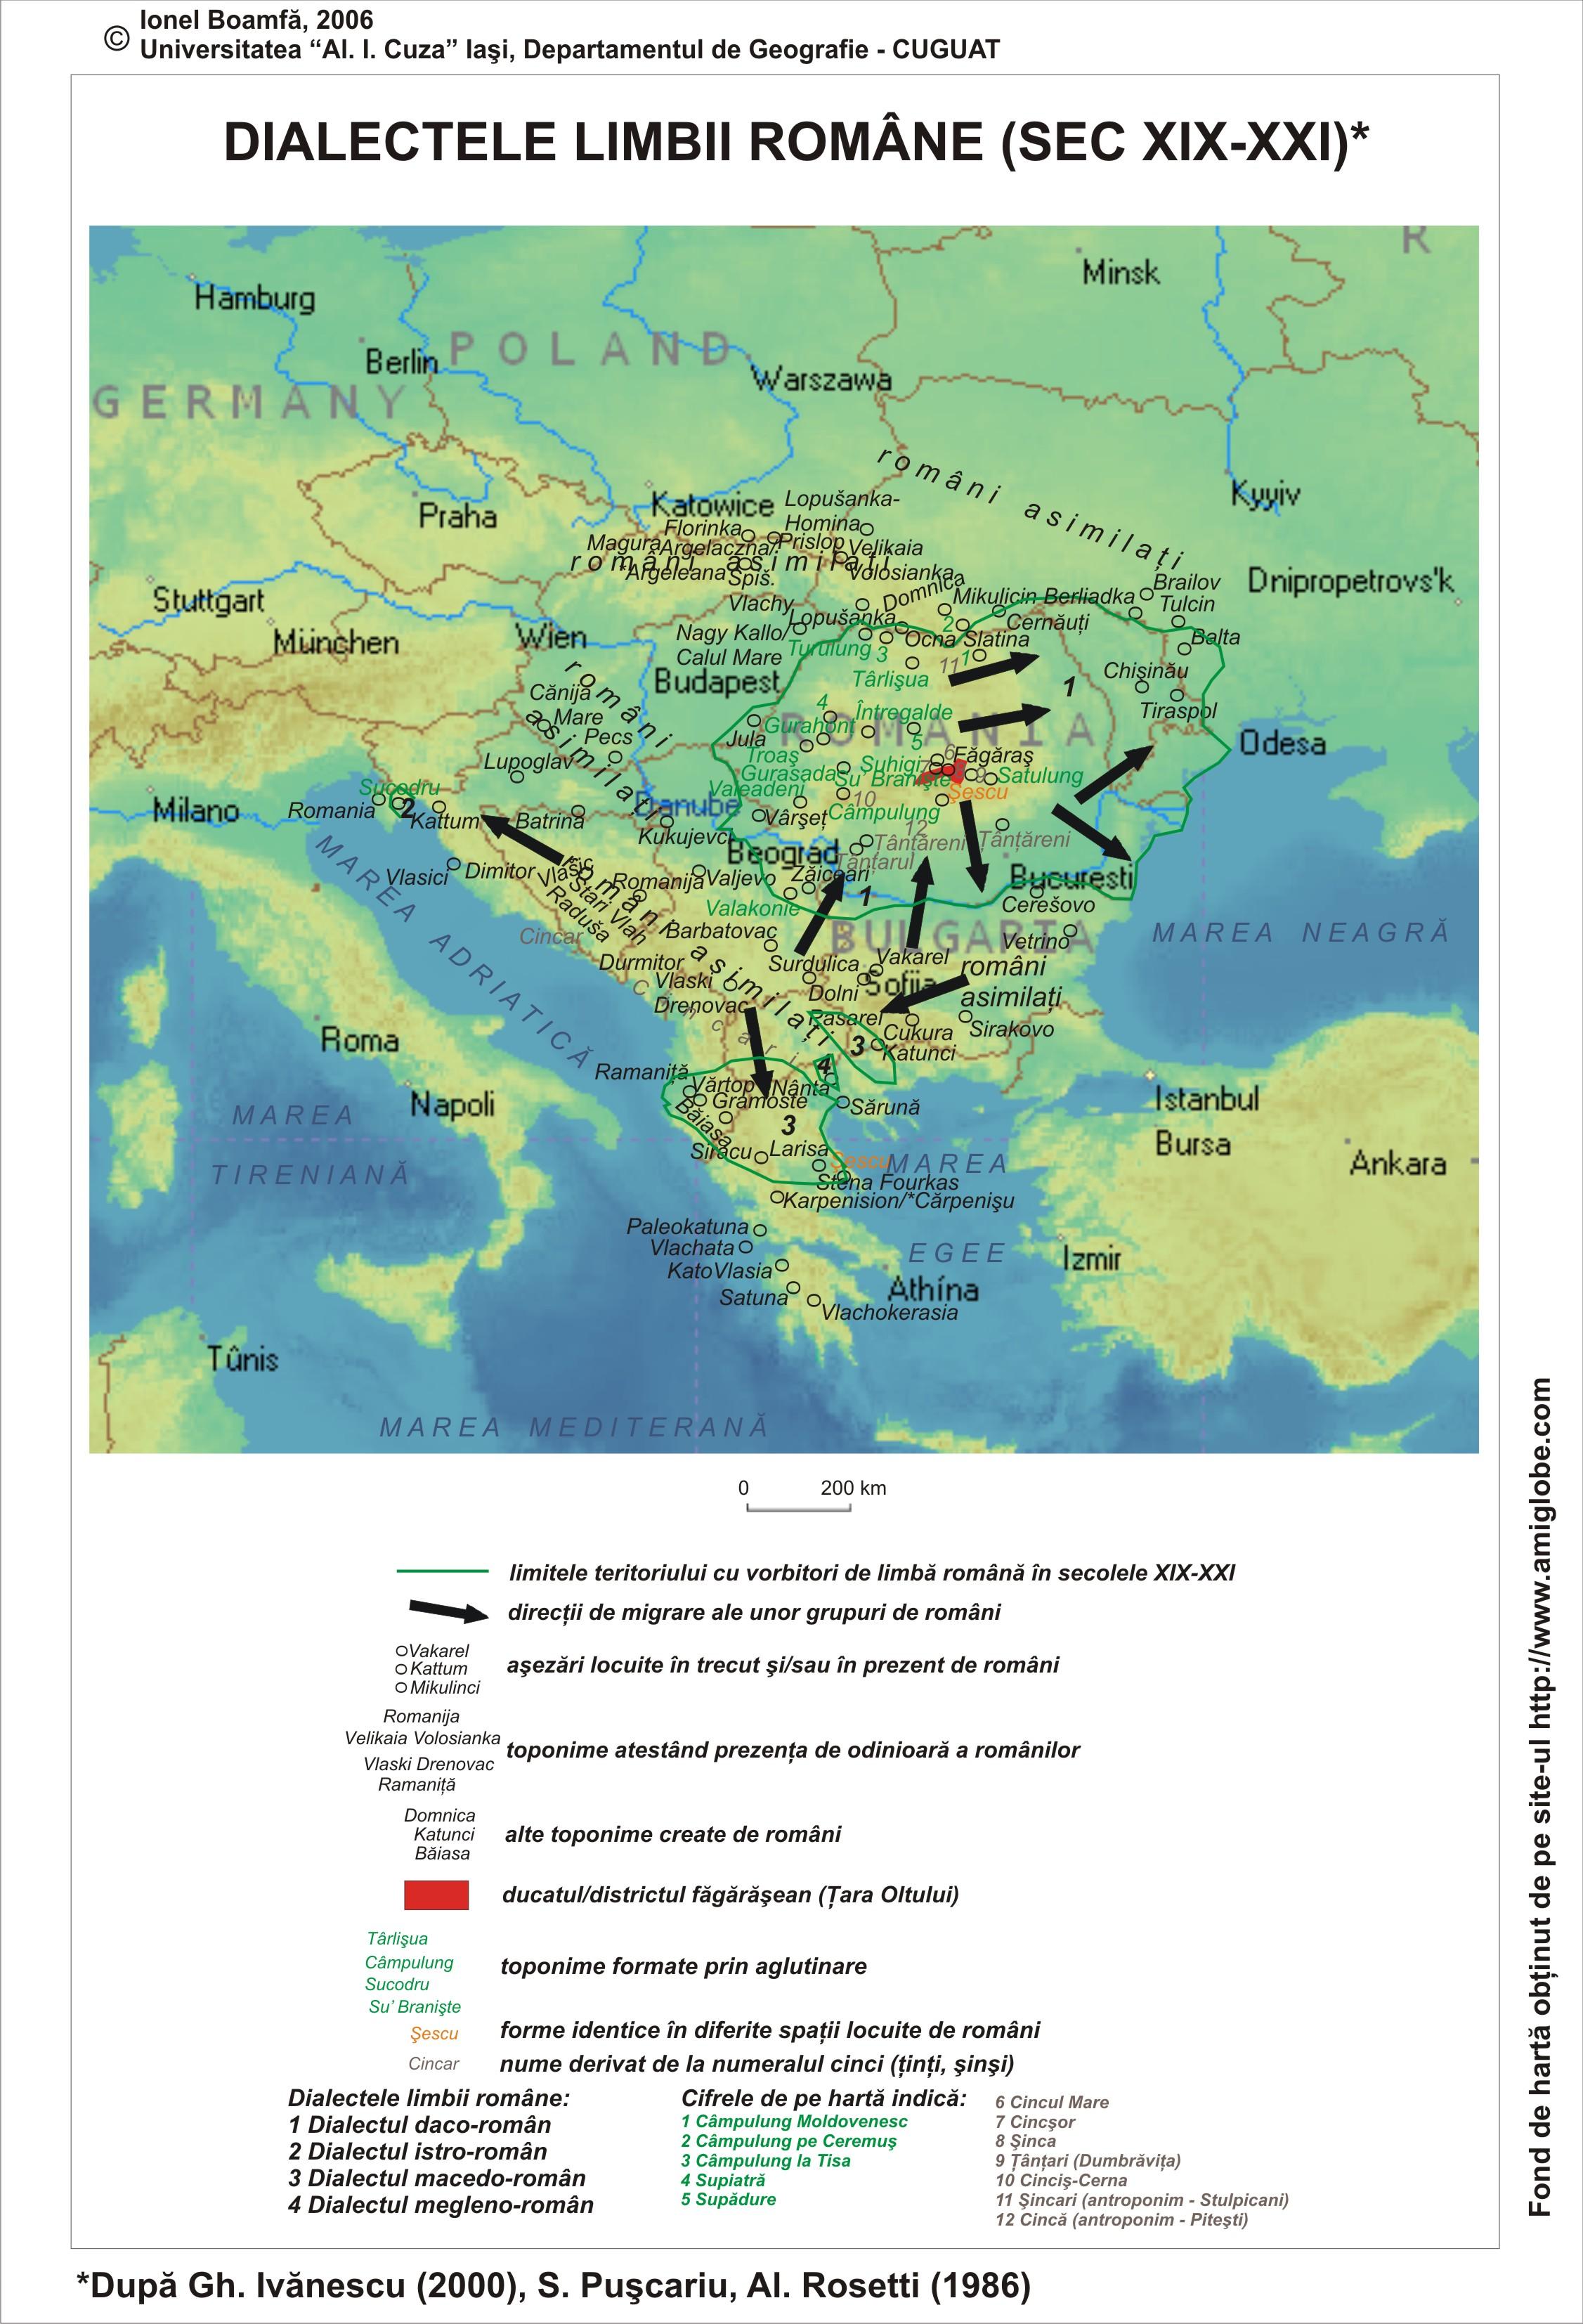 limba-romana-an-1900-refacut